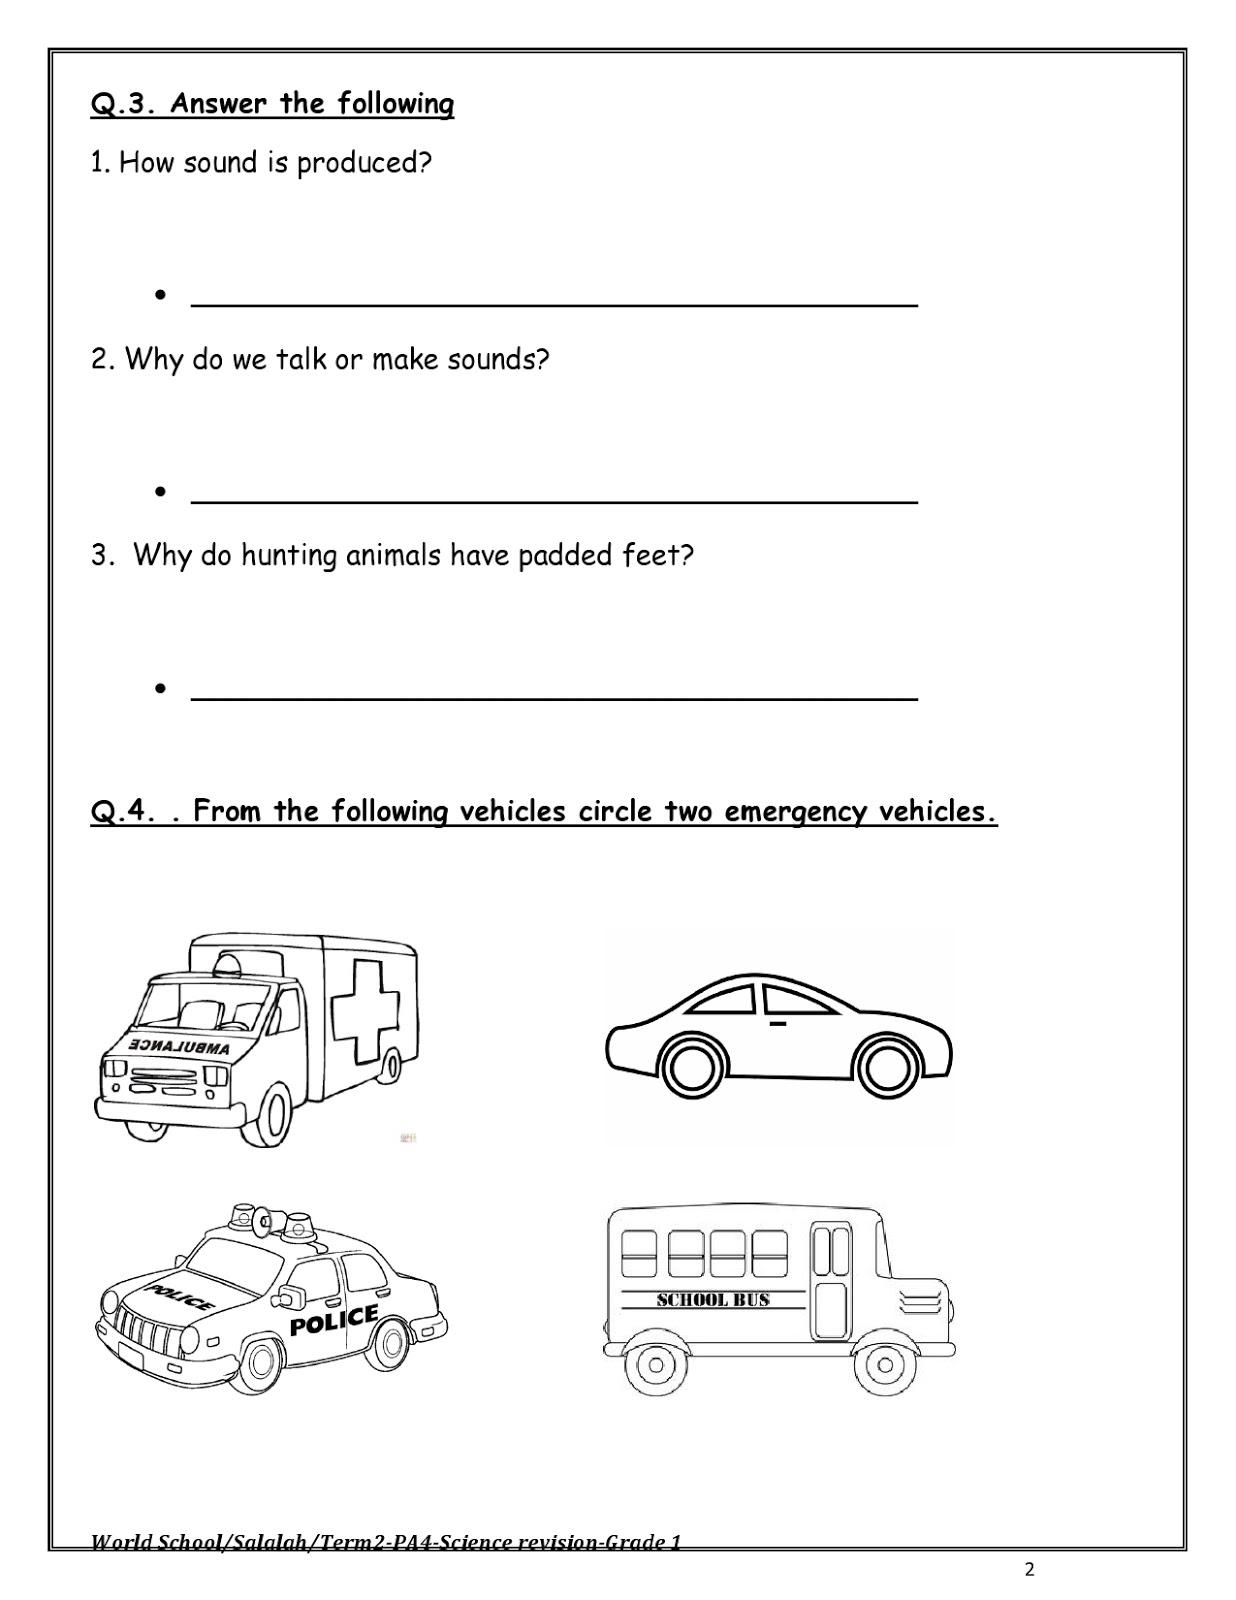 Birla World School Oman Homework For Grade 1 As On 11 04